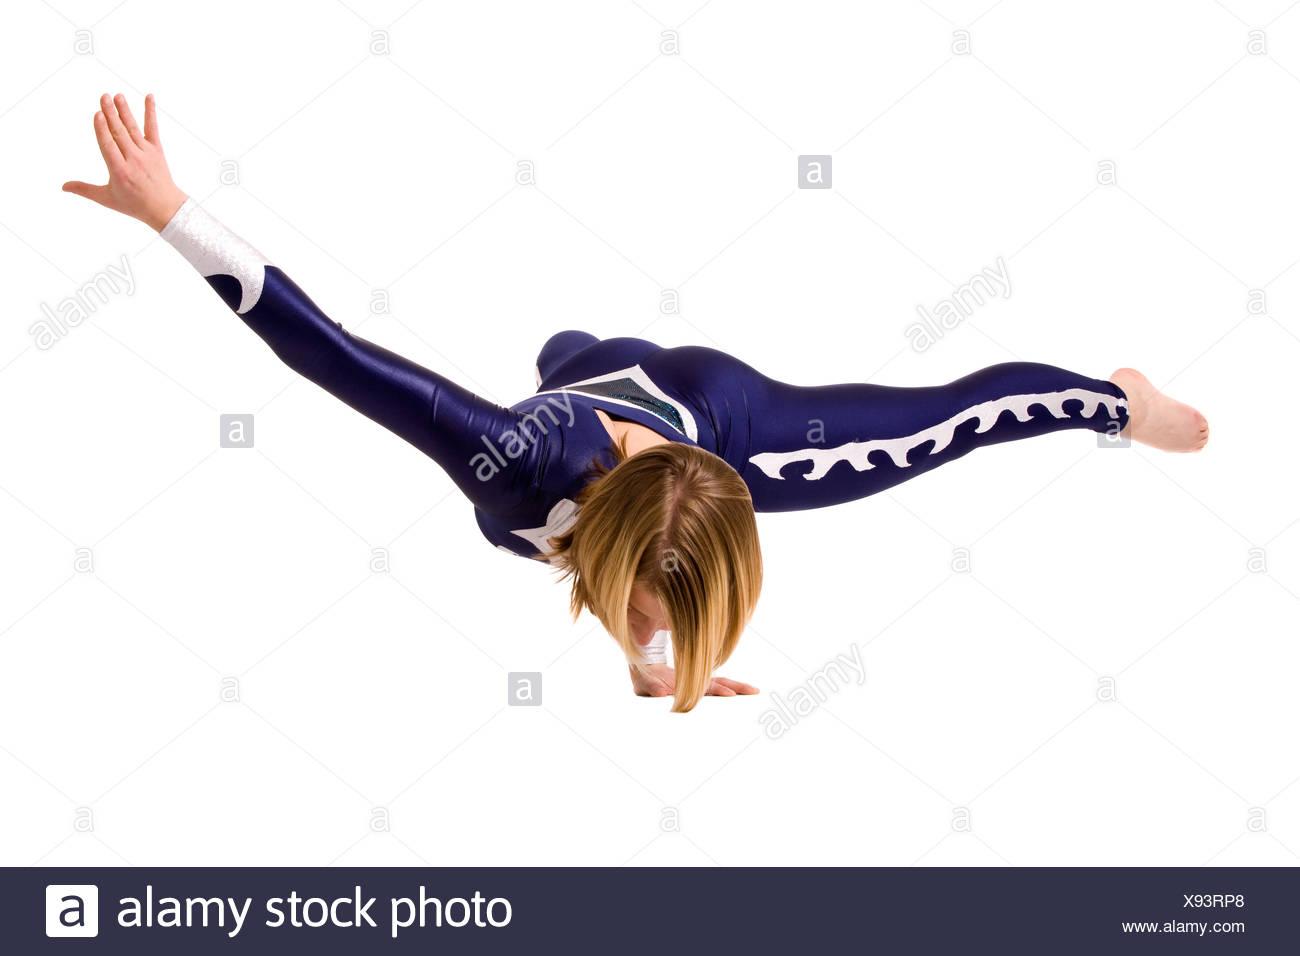 Balancing on one hand - Stock Image